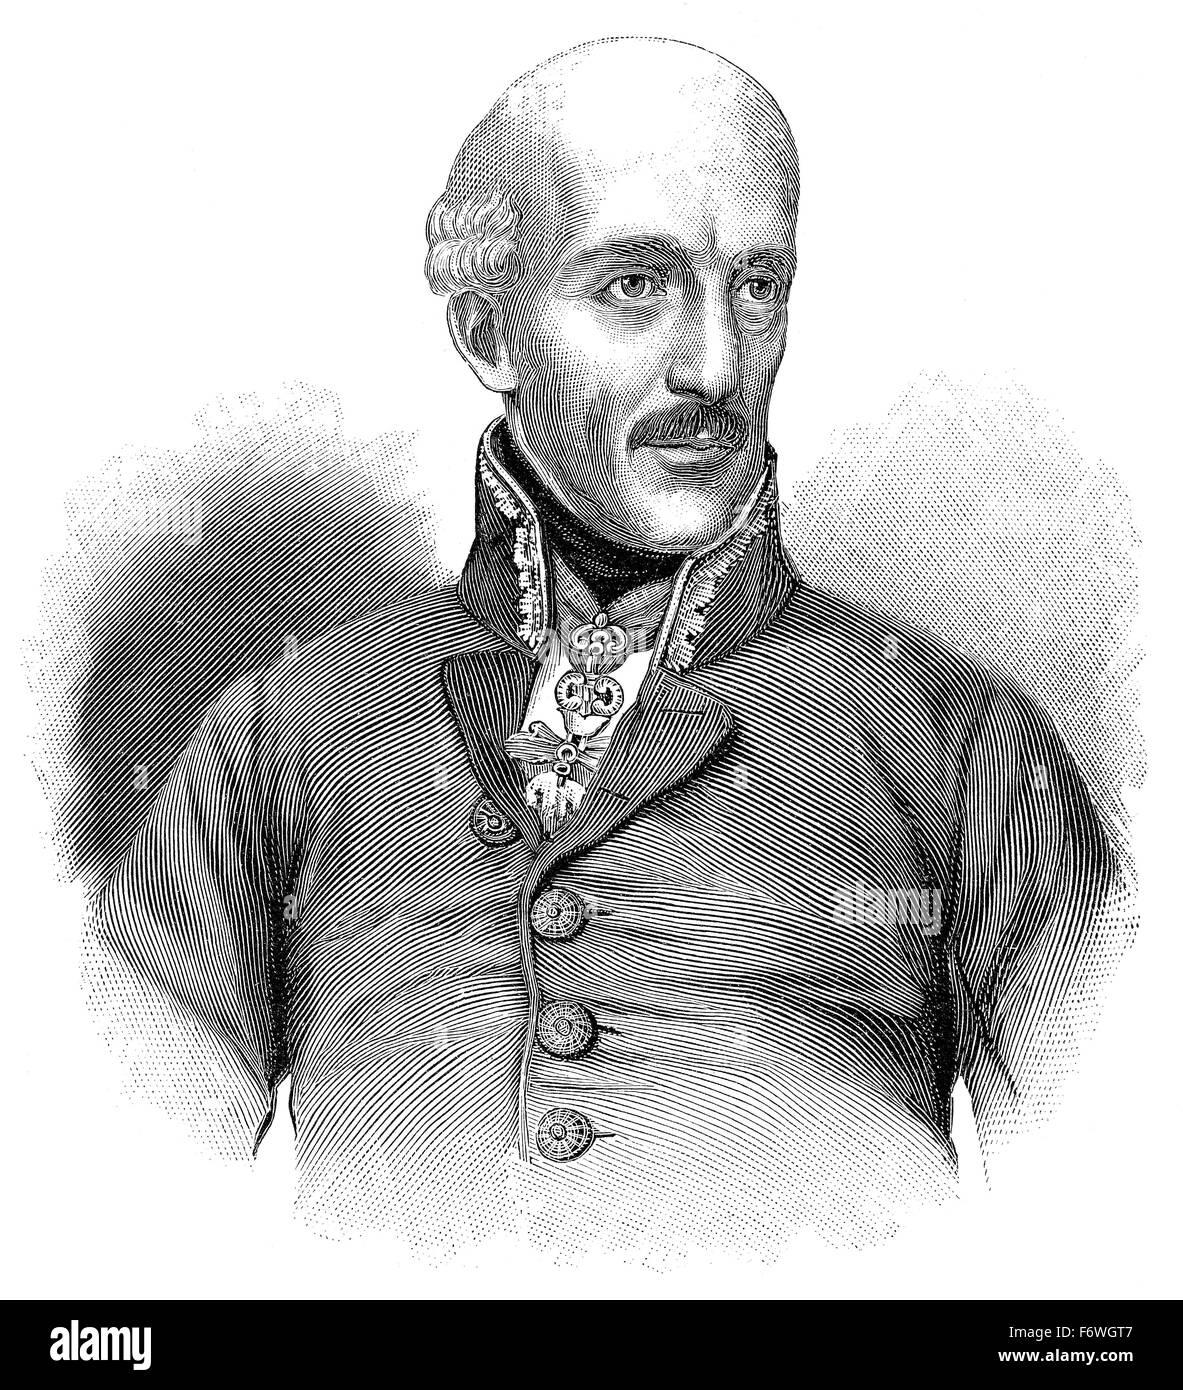 Archduke John of Austria, 1782 - 1859, an Austrian field marshal and German Imperial regent, Habsburg dynasty, Erzherzog - Stock Image